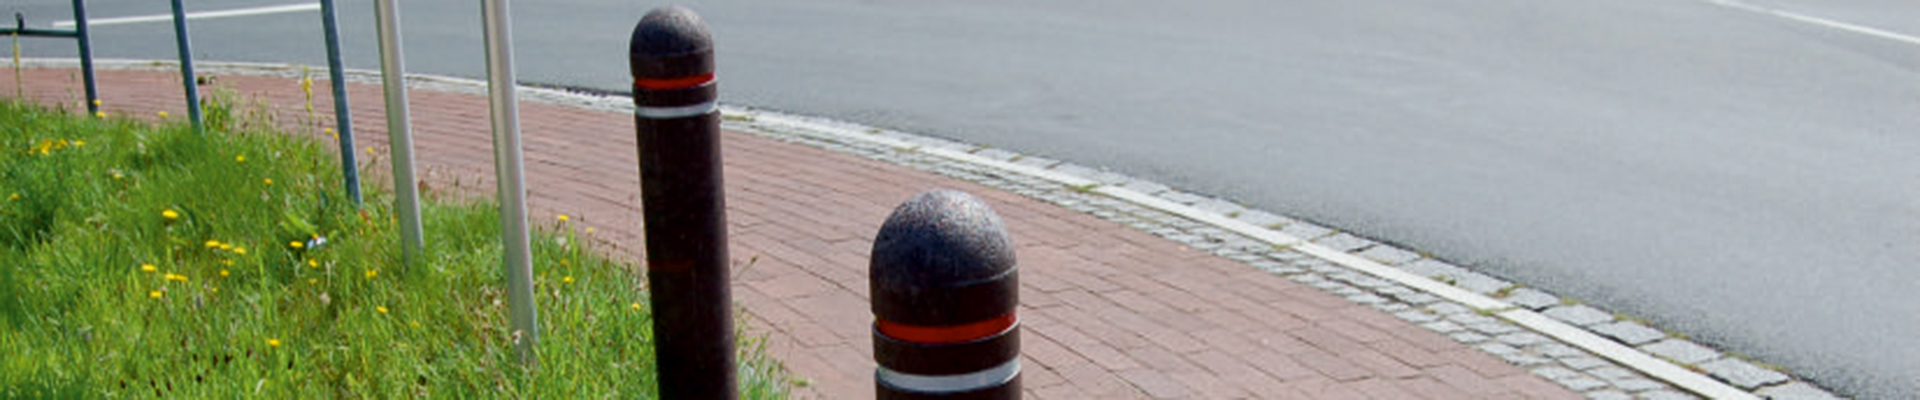 Ph Gummitechnik Poller Halbkigelkopf 15x150